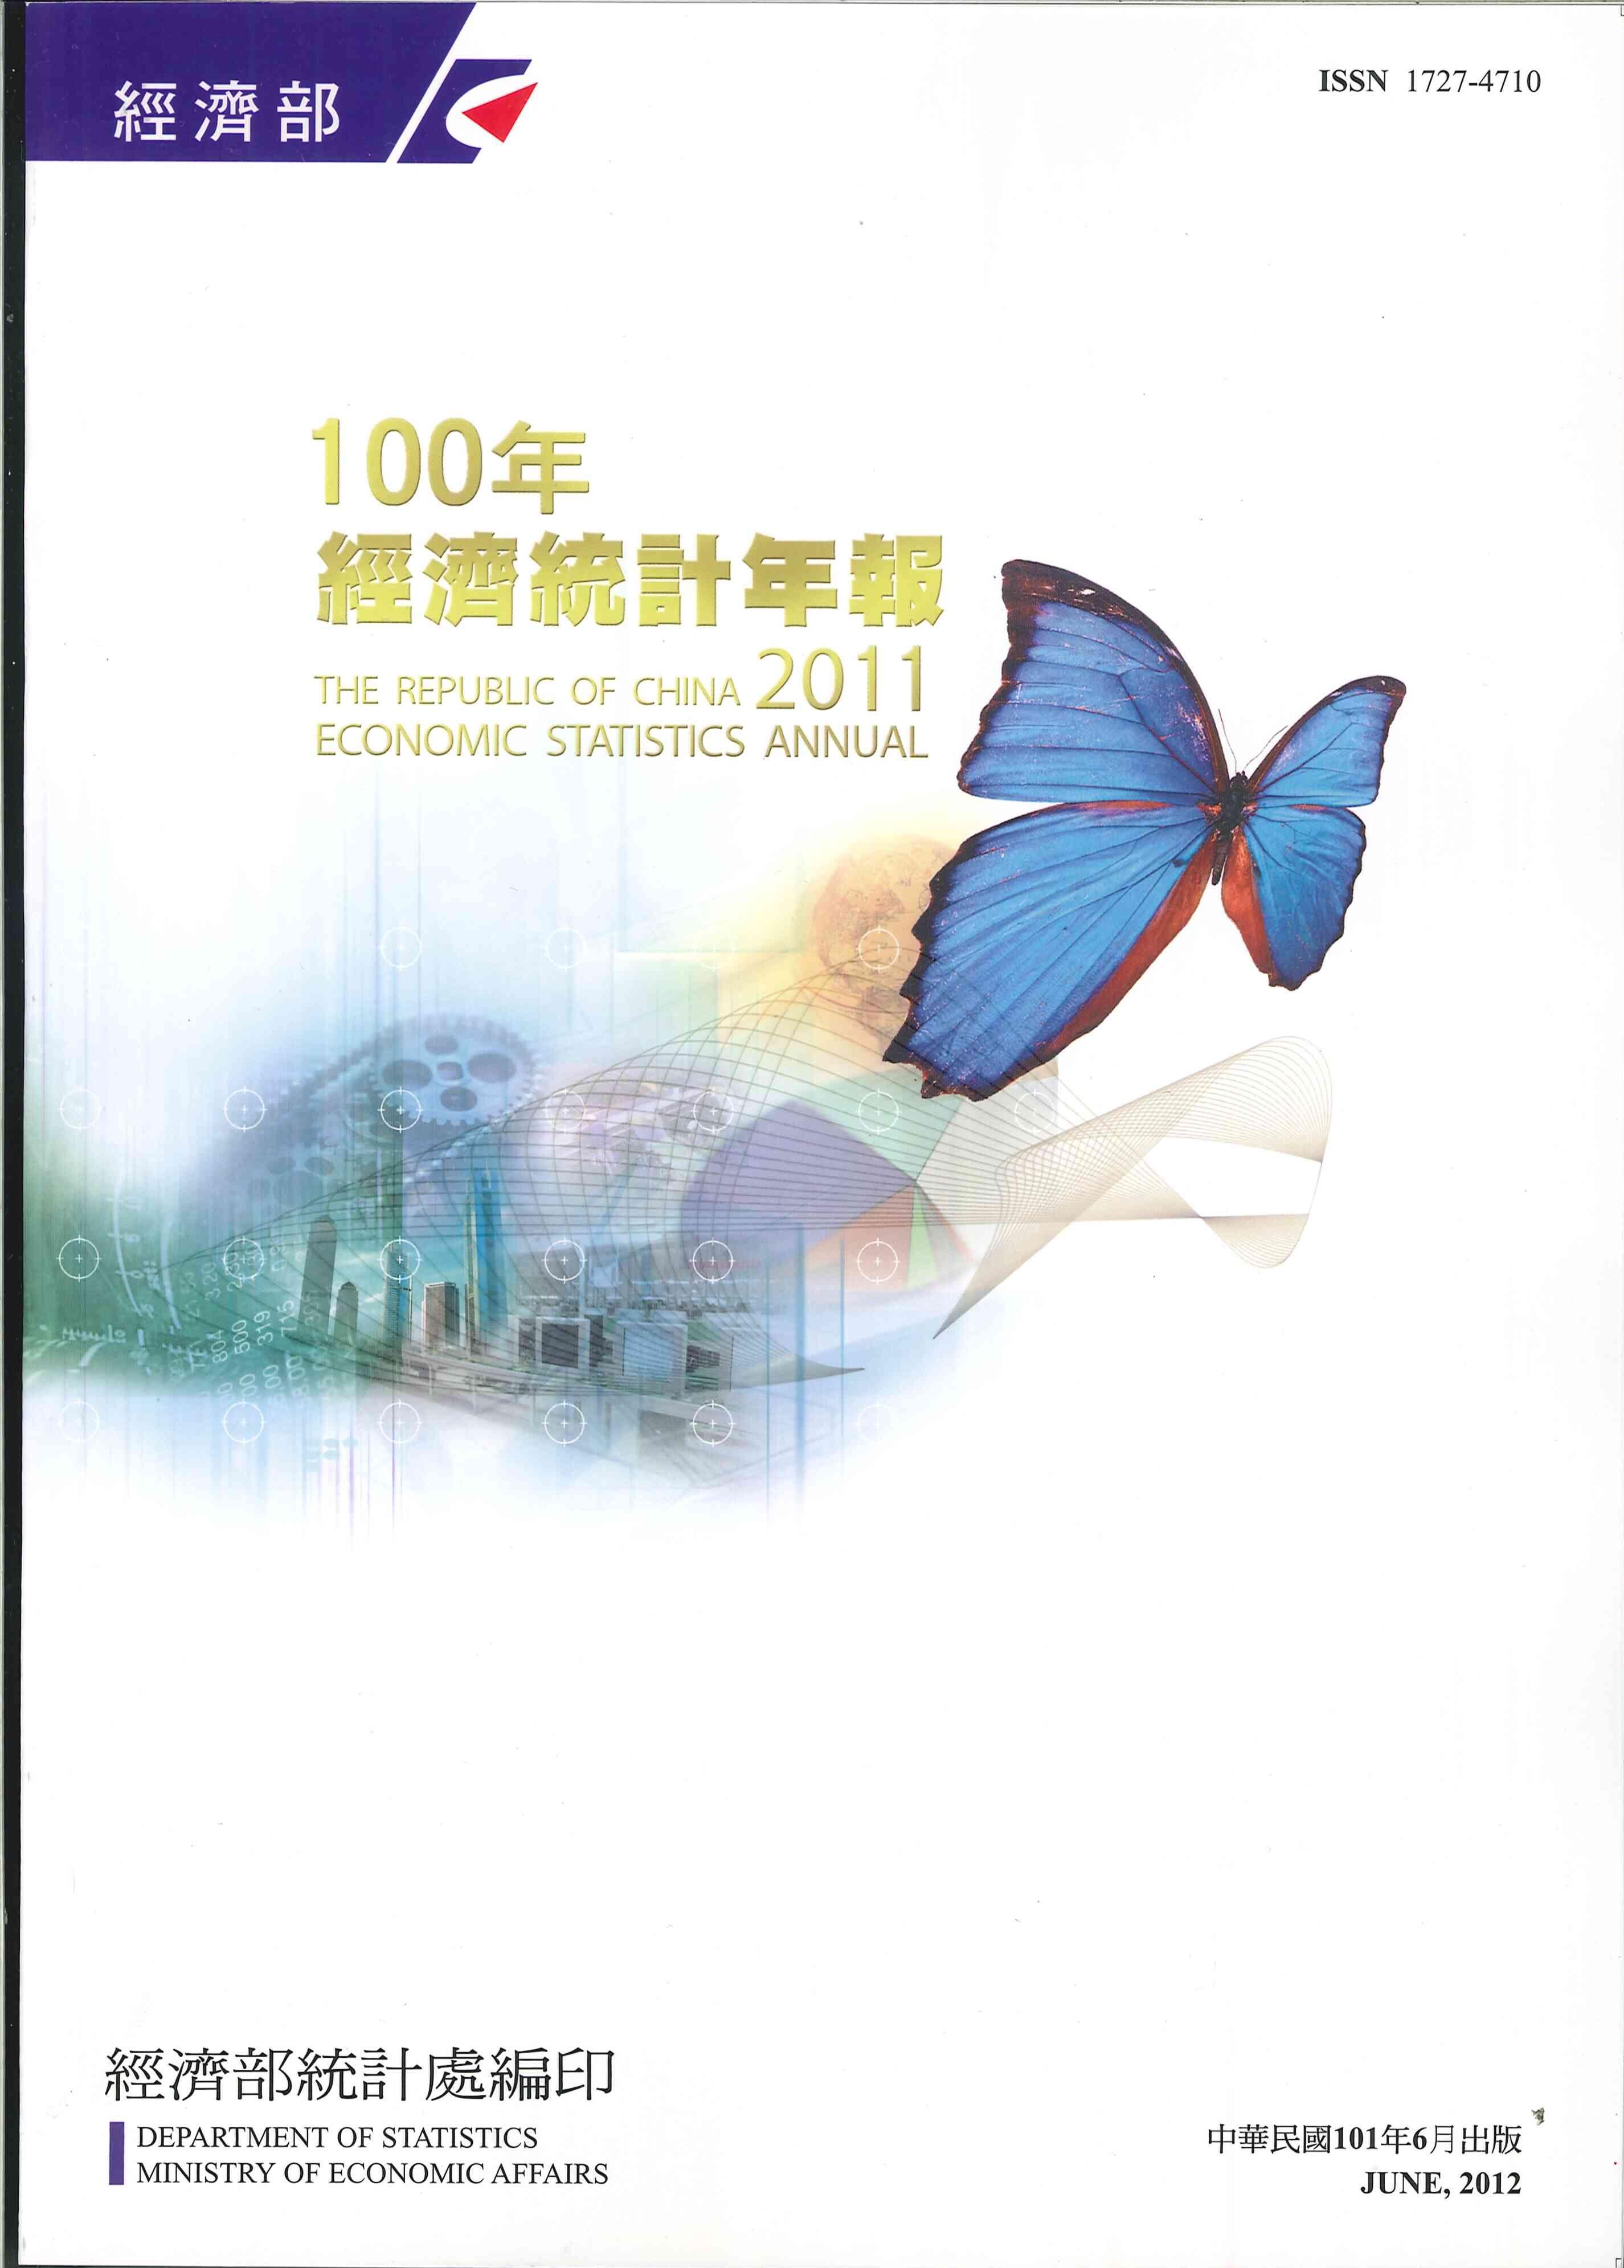 經濟統計年報=Economic statistics annual